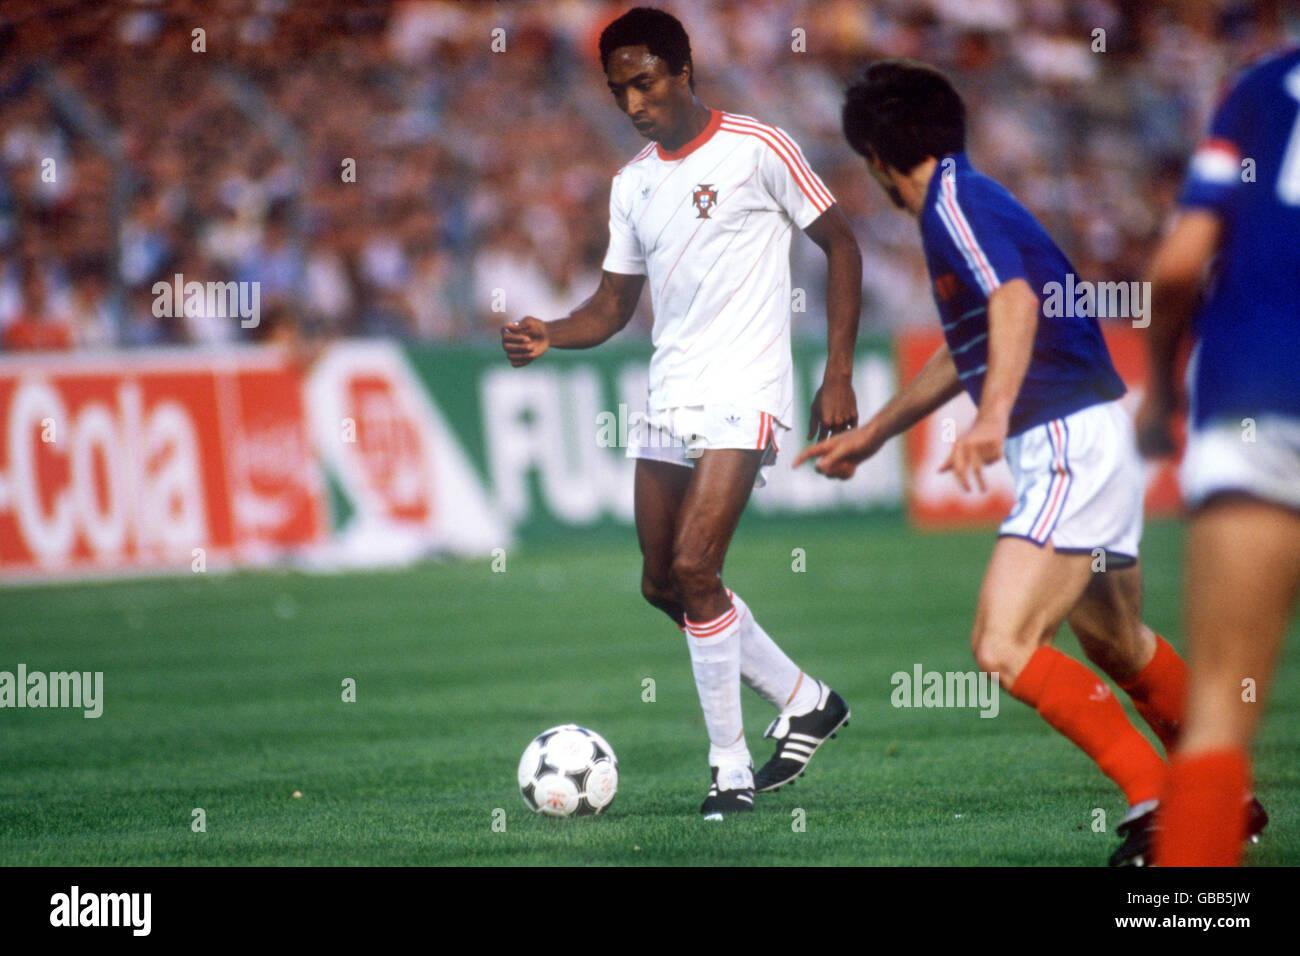 Soccer - European Championship - Semi Final - France v Portugal Stock Photo